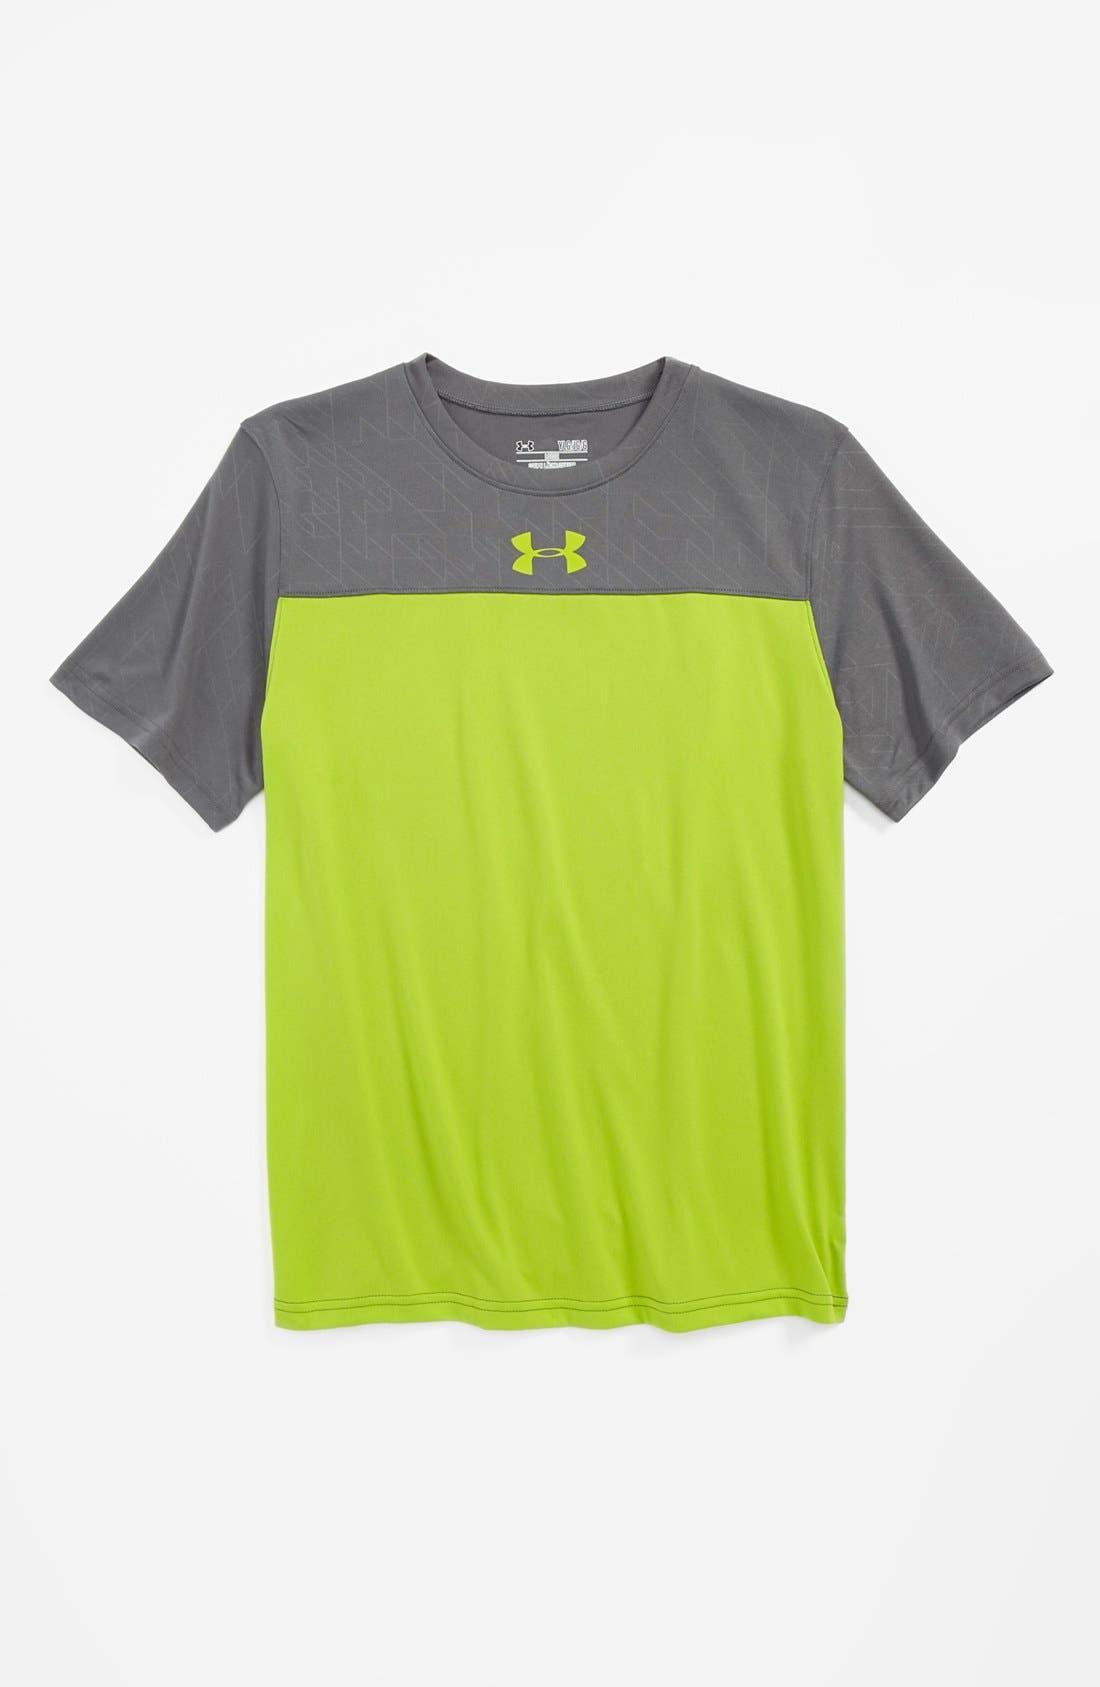 Main Image - Under Armour 'Brouhaha' HeatGear® T-Shirt (Big Boys)